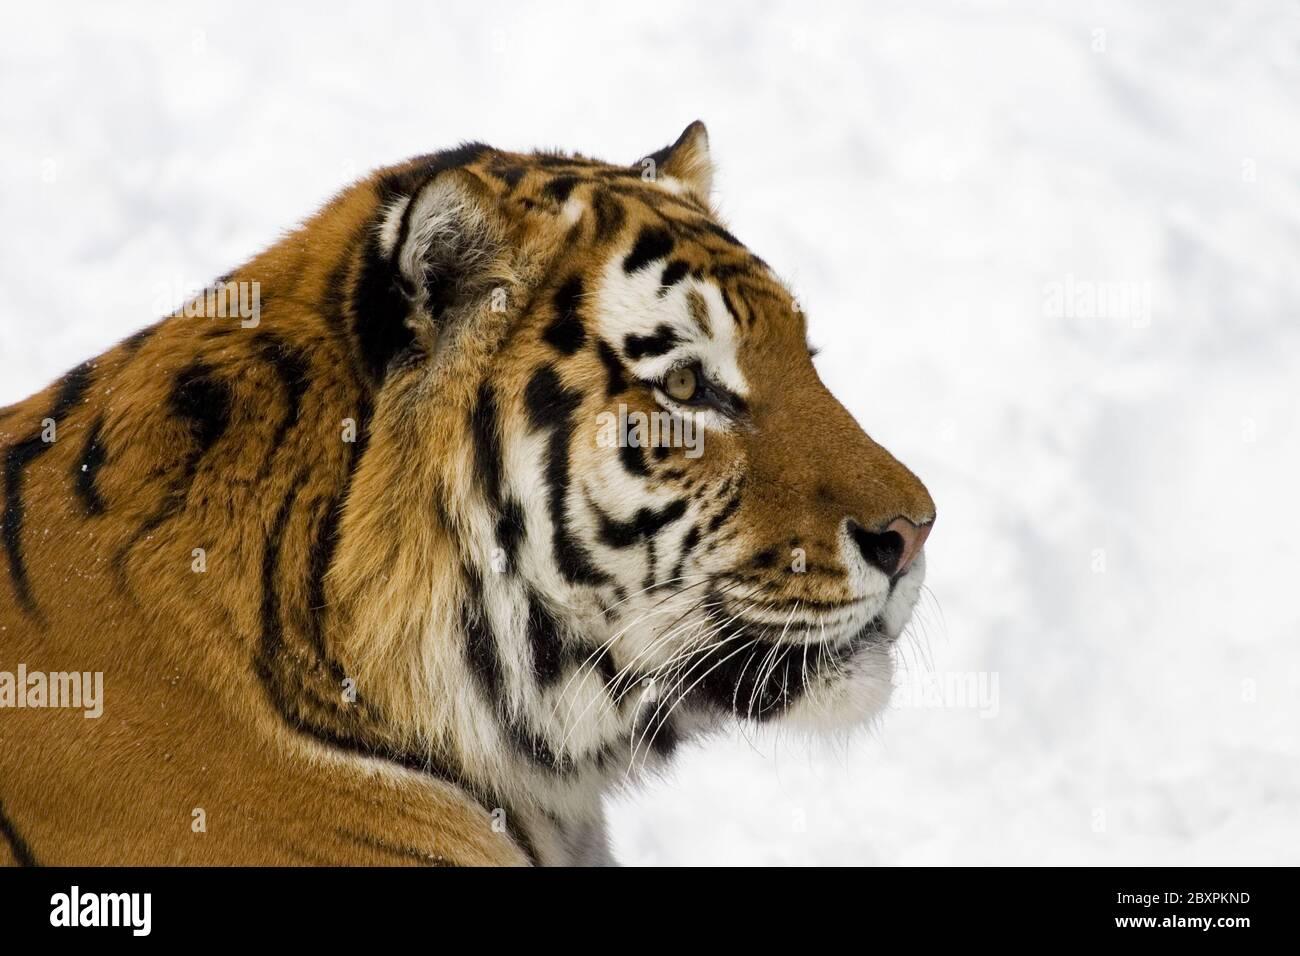 Tigre de Sibérie (Panthera tigris altaica) in snow Banque D'Images